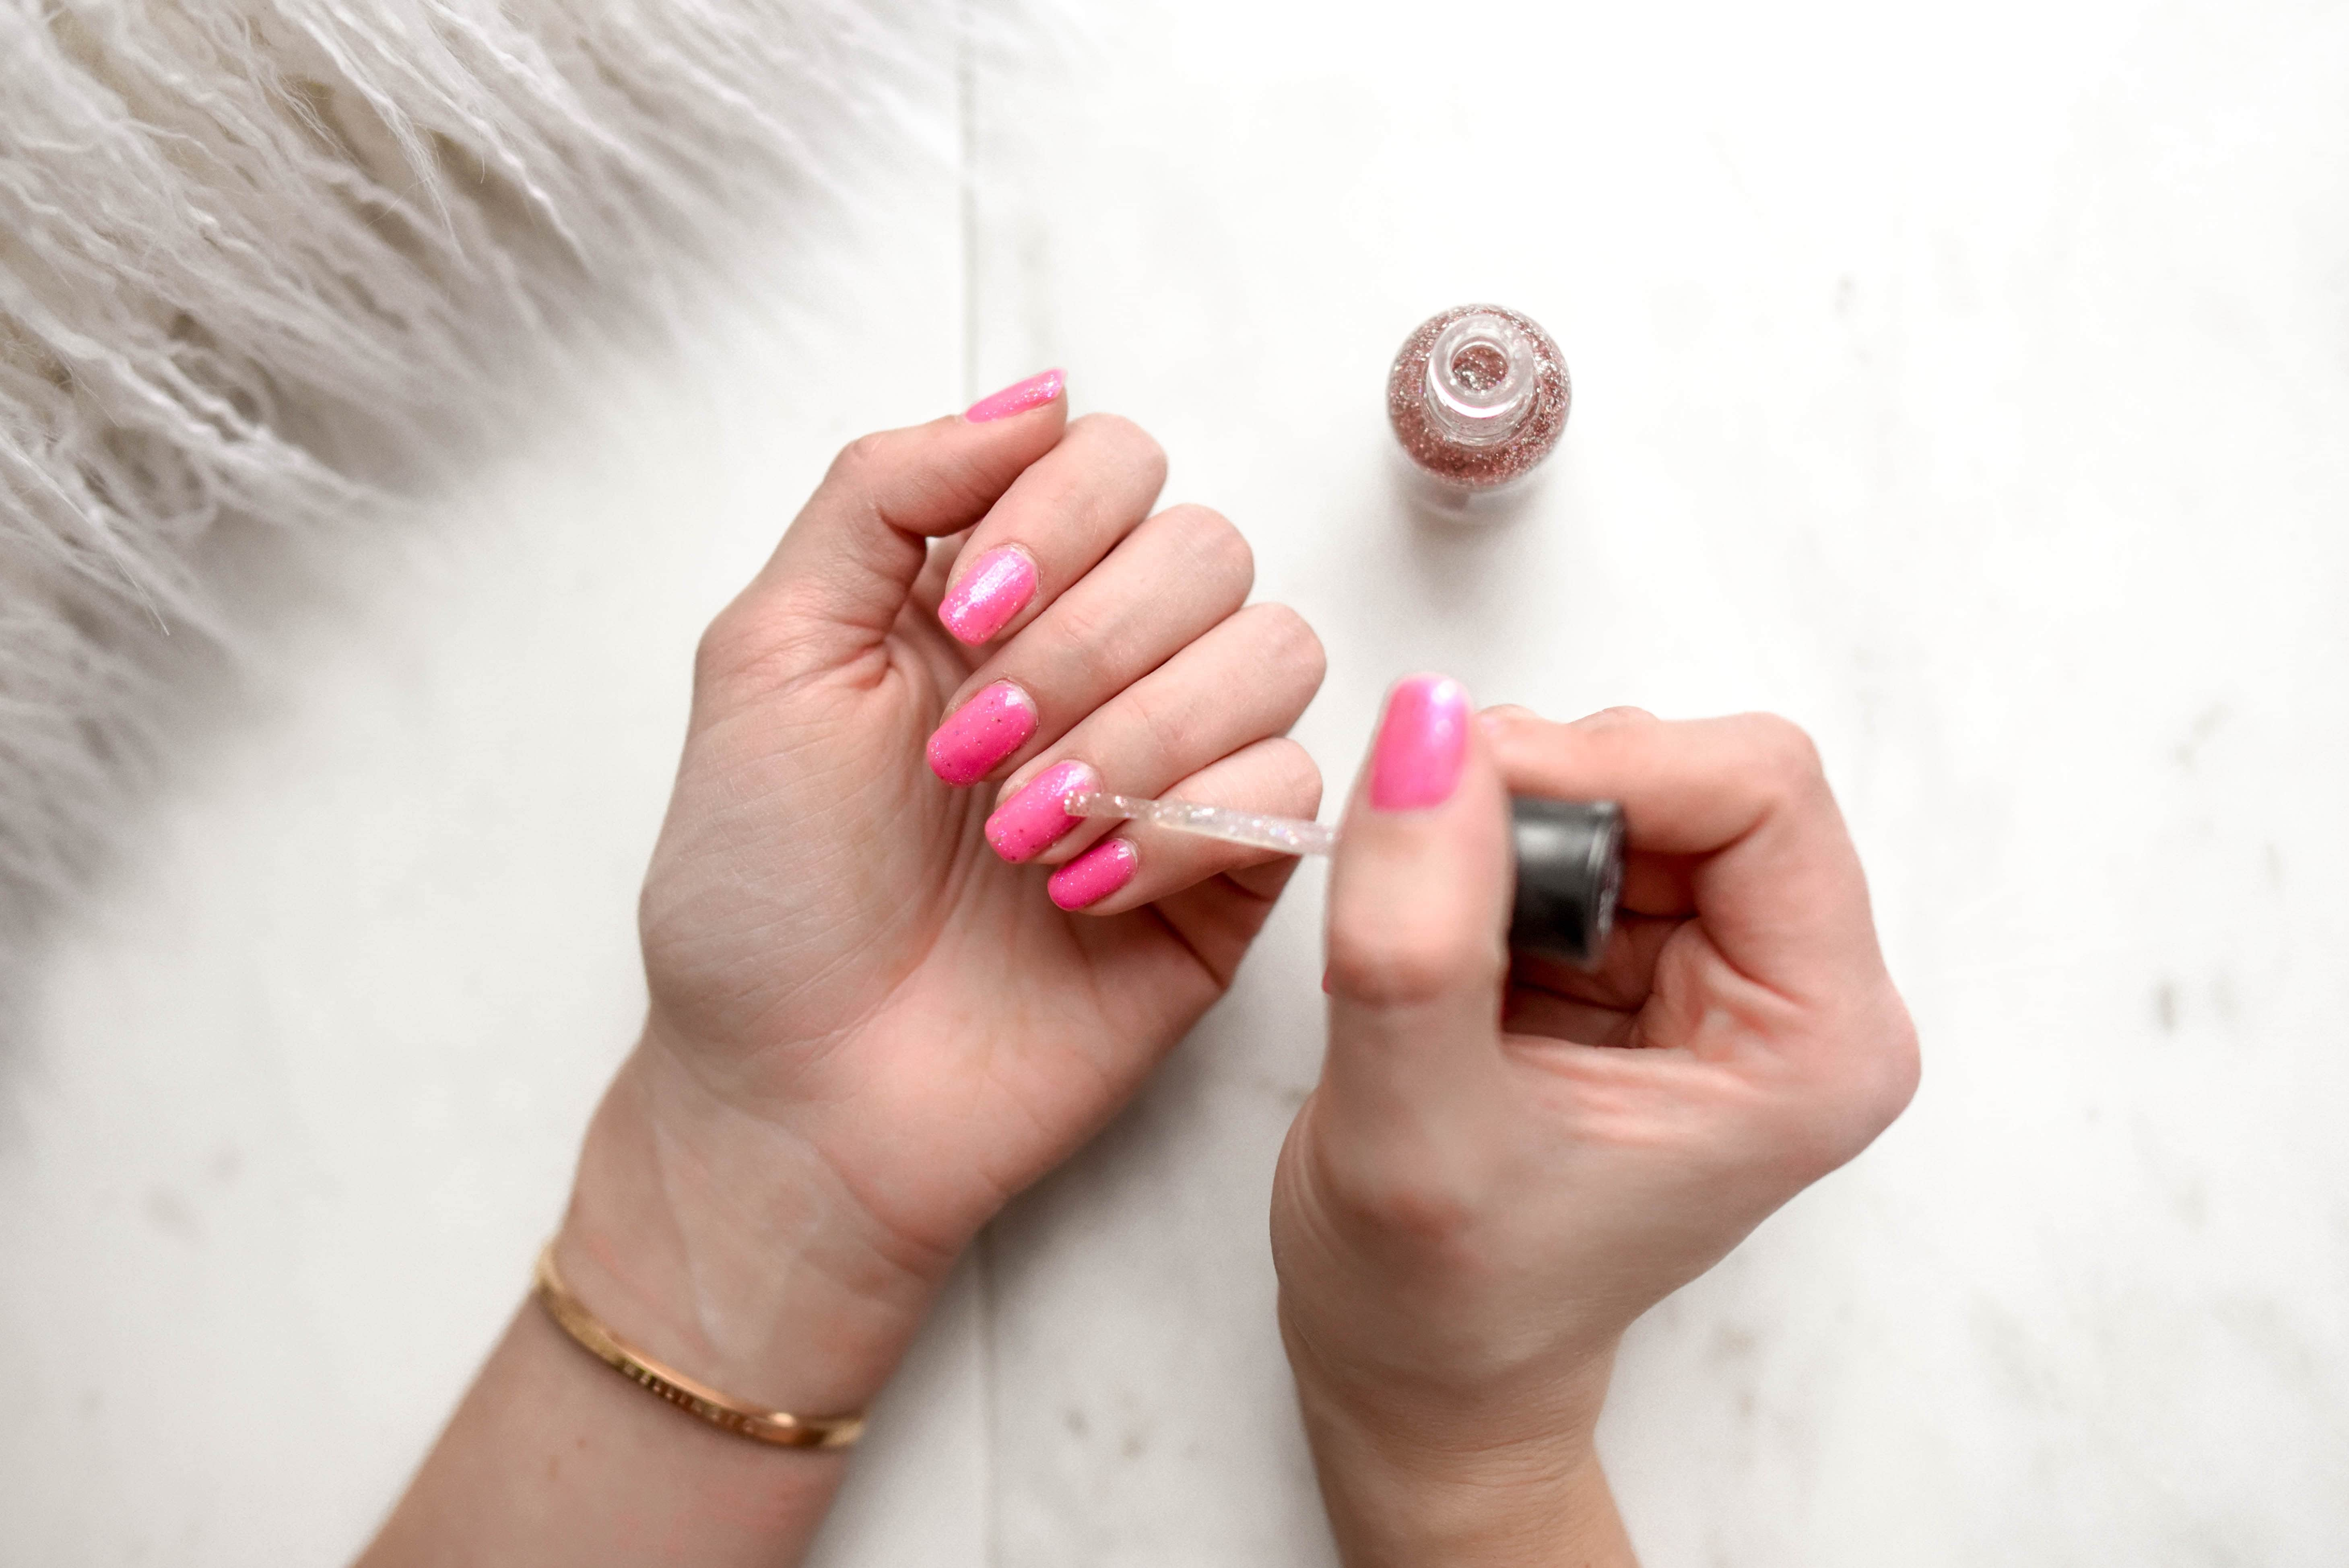 A woman puts pink nail polish on her nails